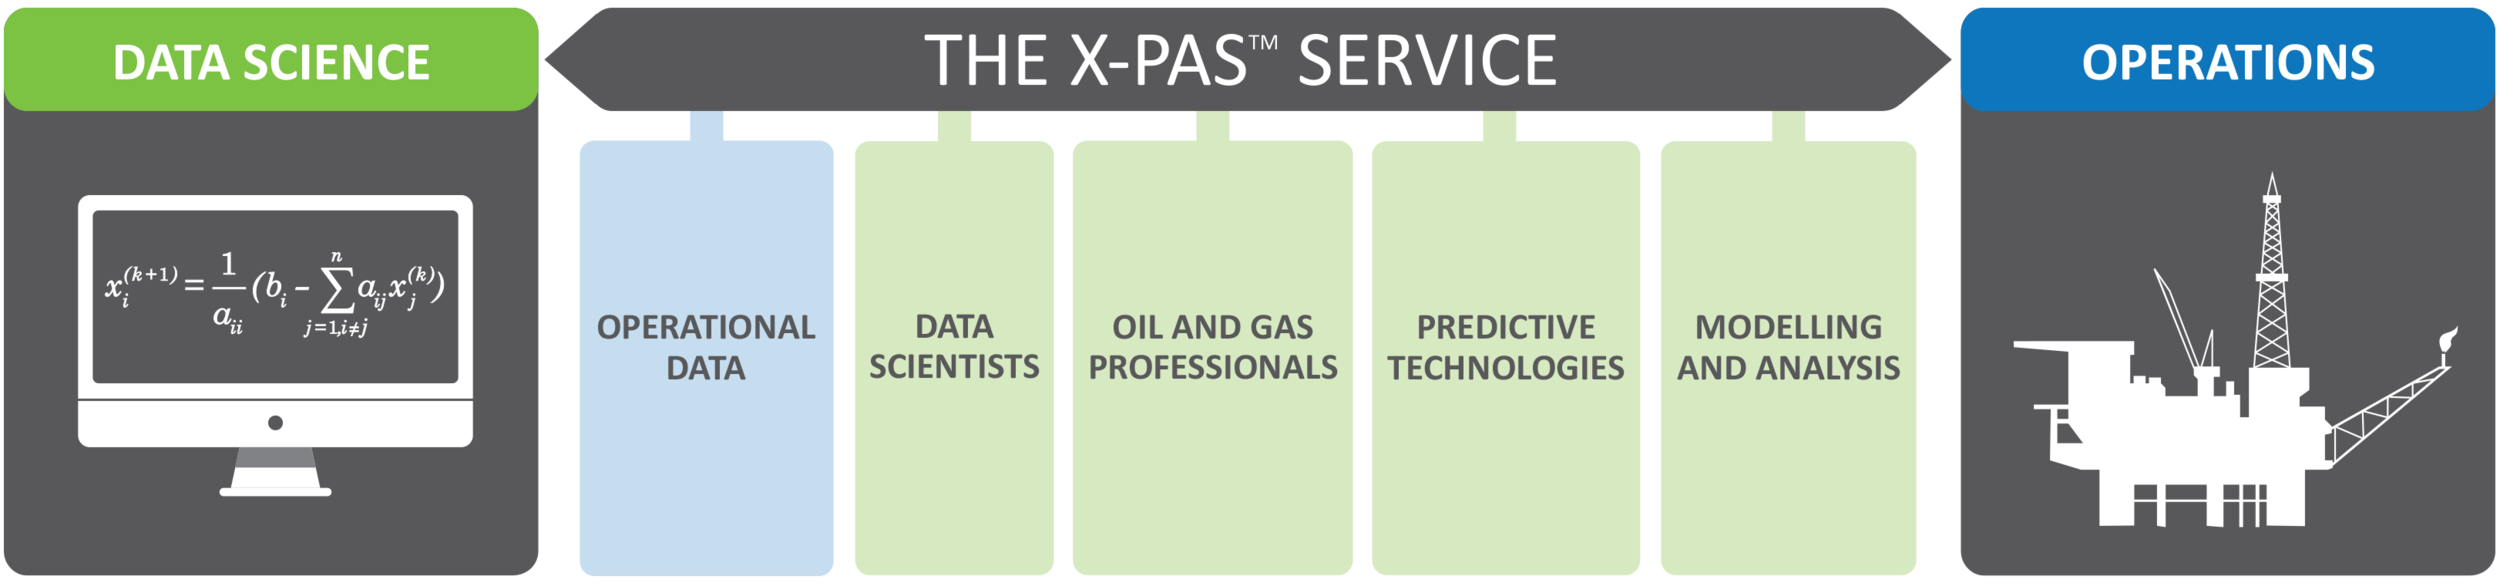 XPAS Bridging the Gap